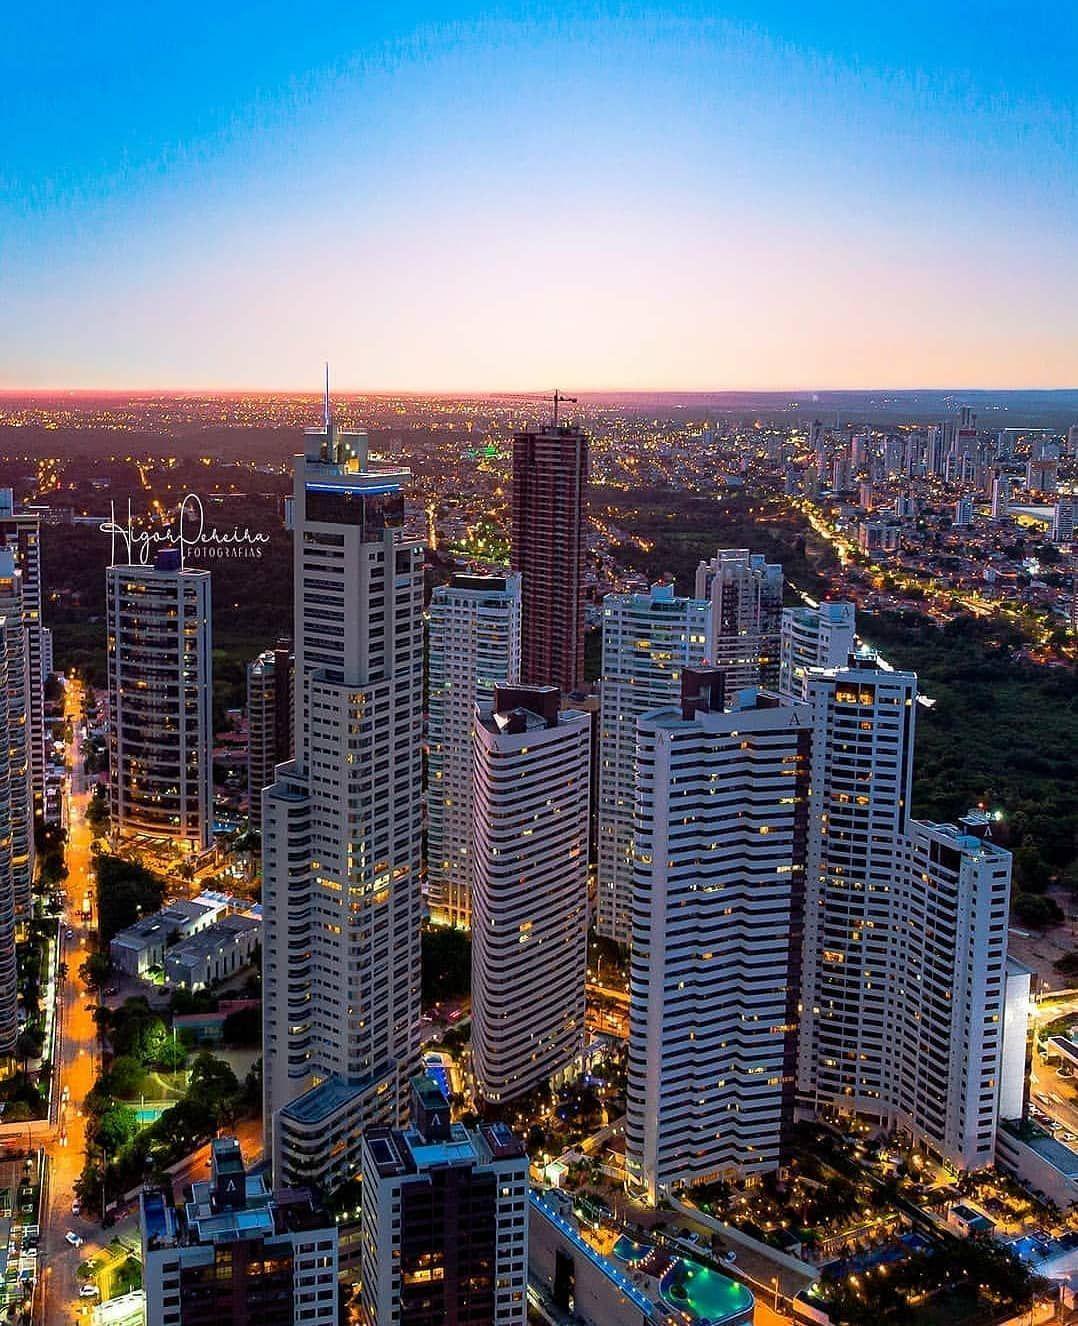 "#JoãoPessoaParaiba ® on Instagram: ""Boa noite, capital! 😍 🏙️🌃 . . . . . . . . . 📍 Altiplano 📷 @higor_fotografias . . . . . . . . . . #joaopessoa #paraiba #brazil #travel…"""